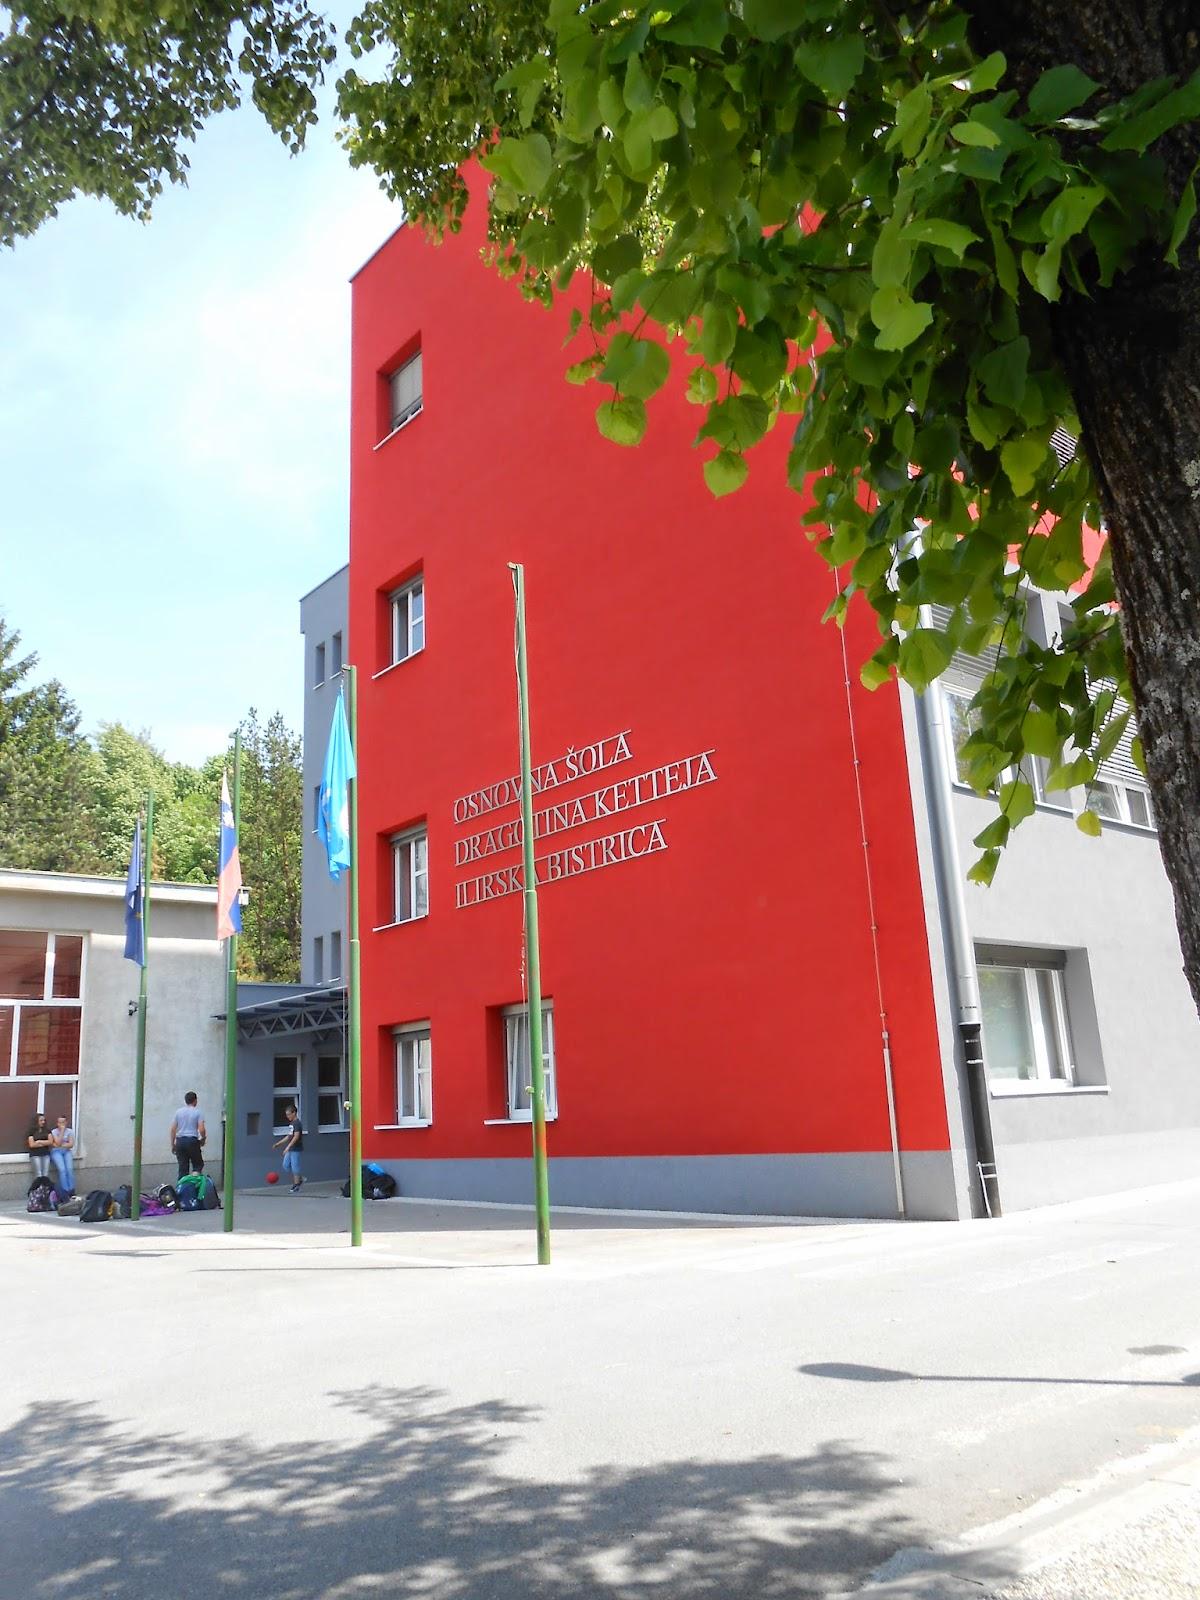 Športni dan 4. a in 4. b, Ilirska Bistrica, 19. 5. 2015 - DSCN4672.JPG